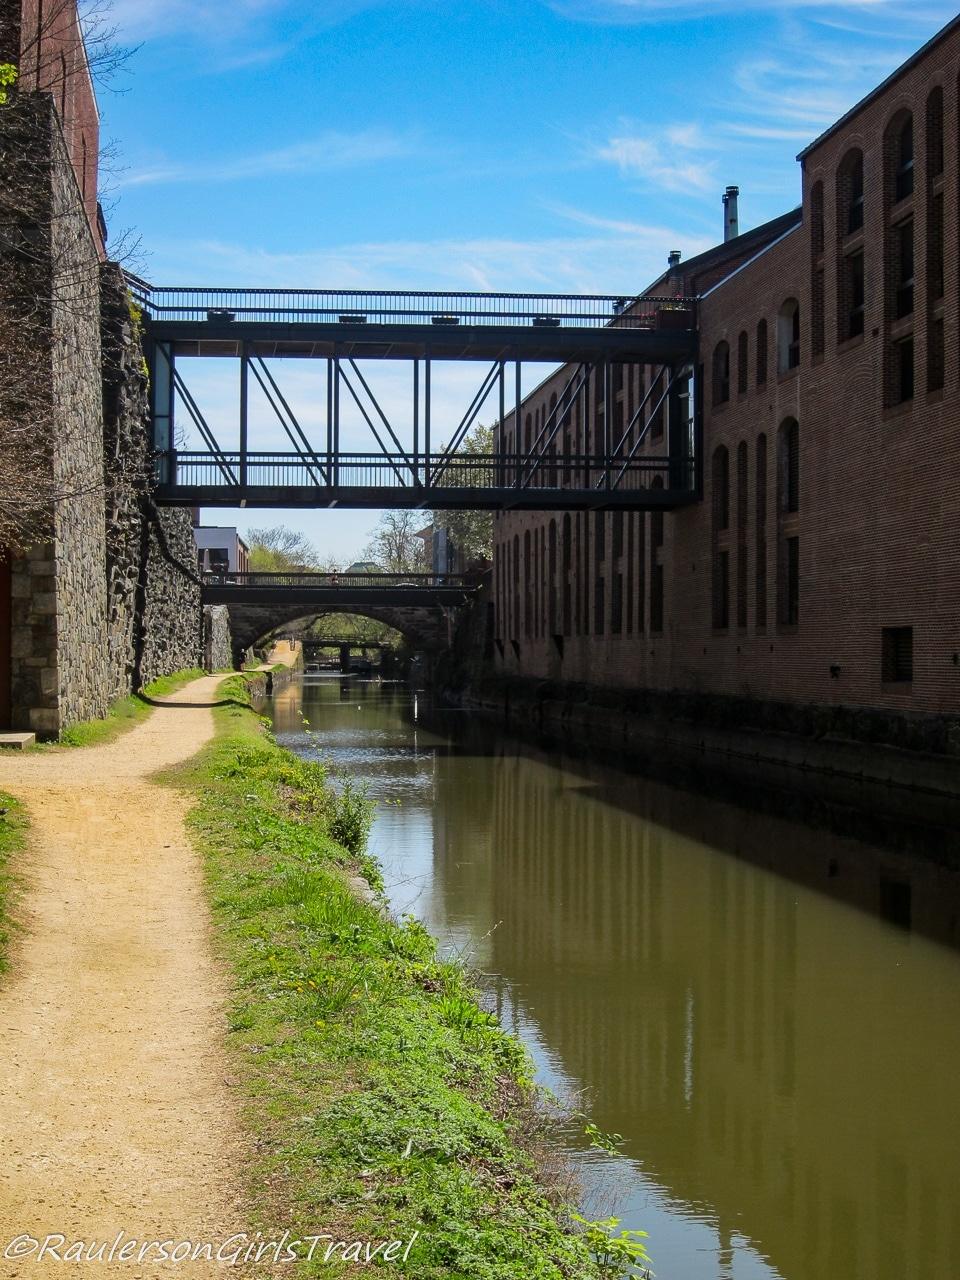 Bridges over the Chesapeake and Ohio Canal